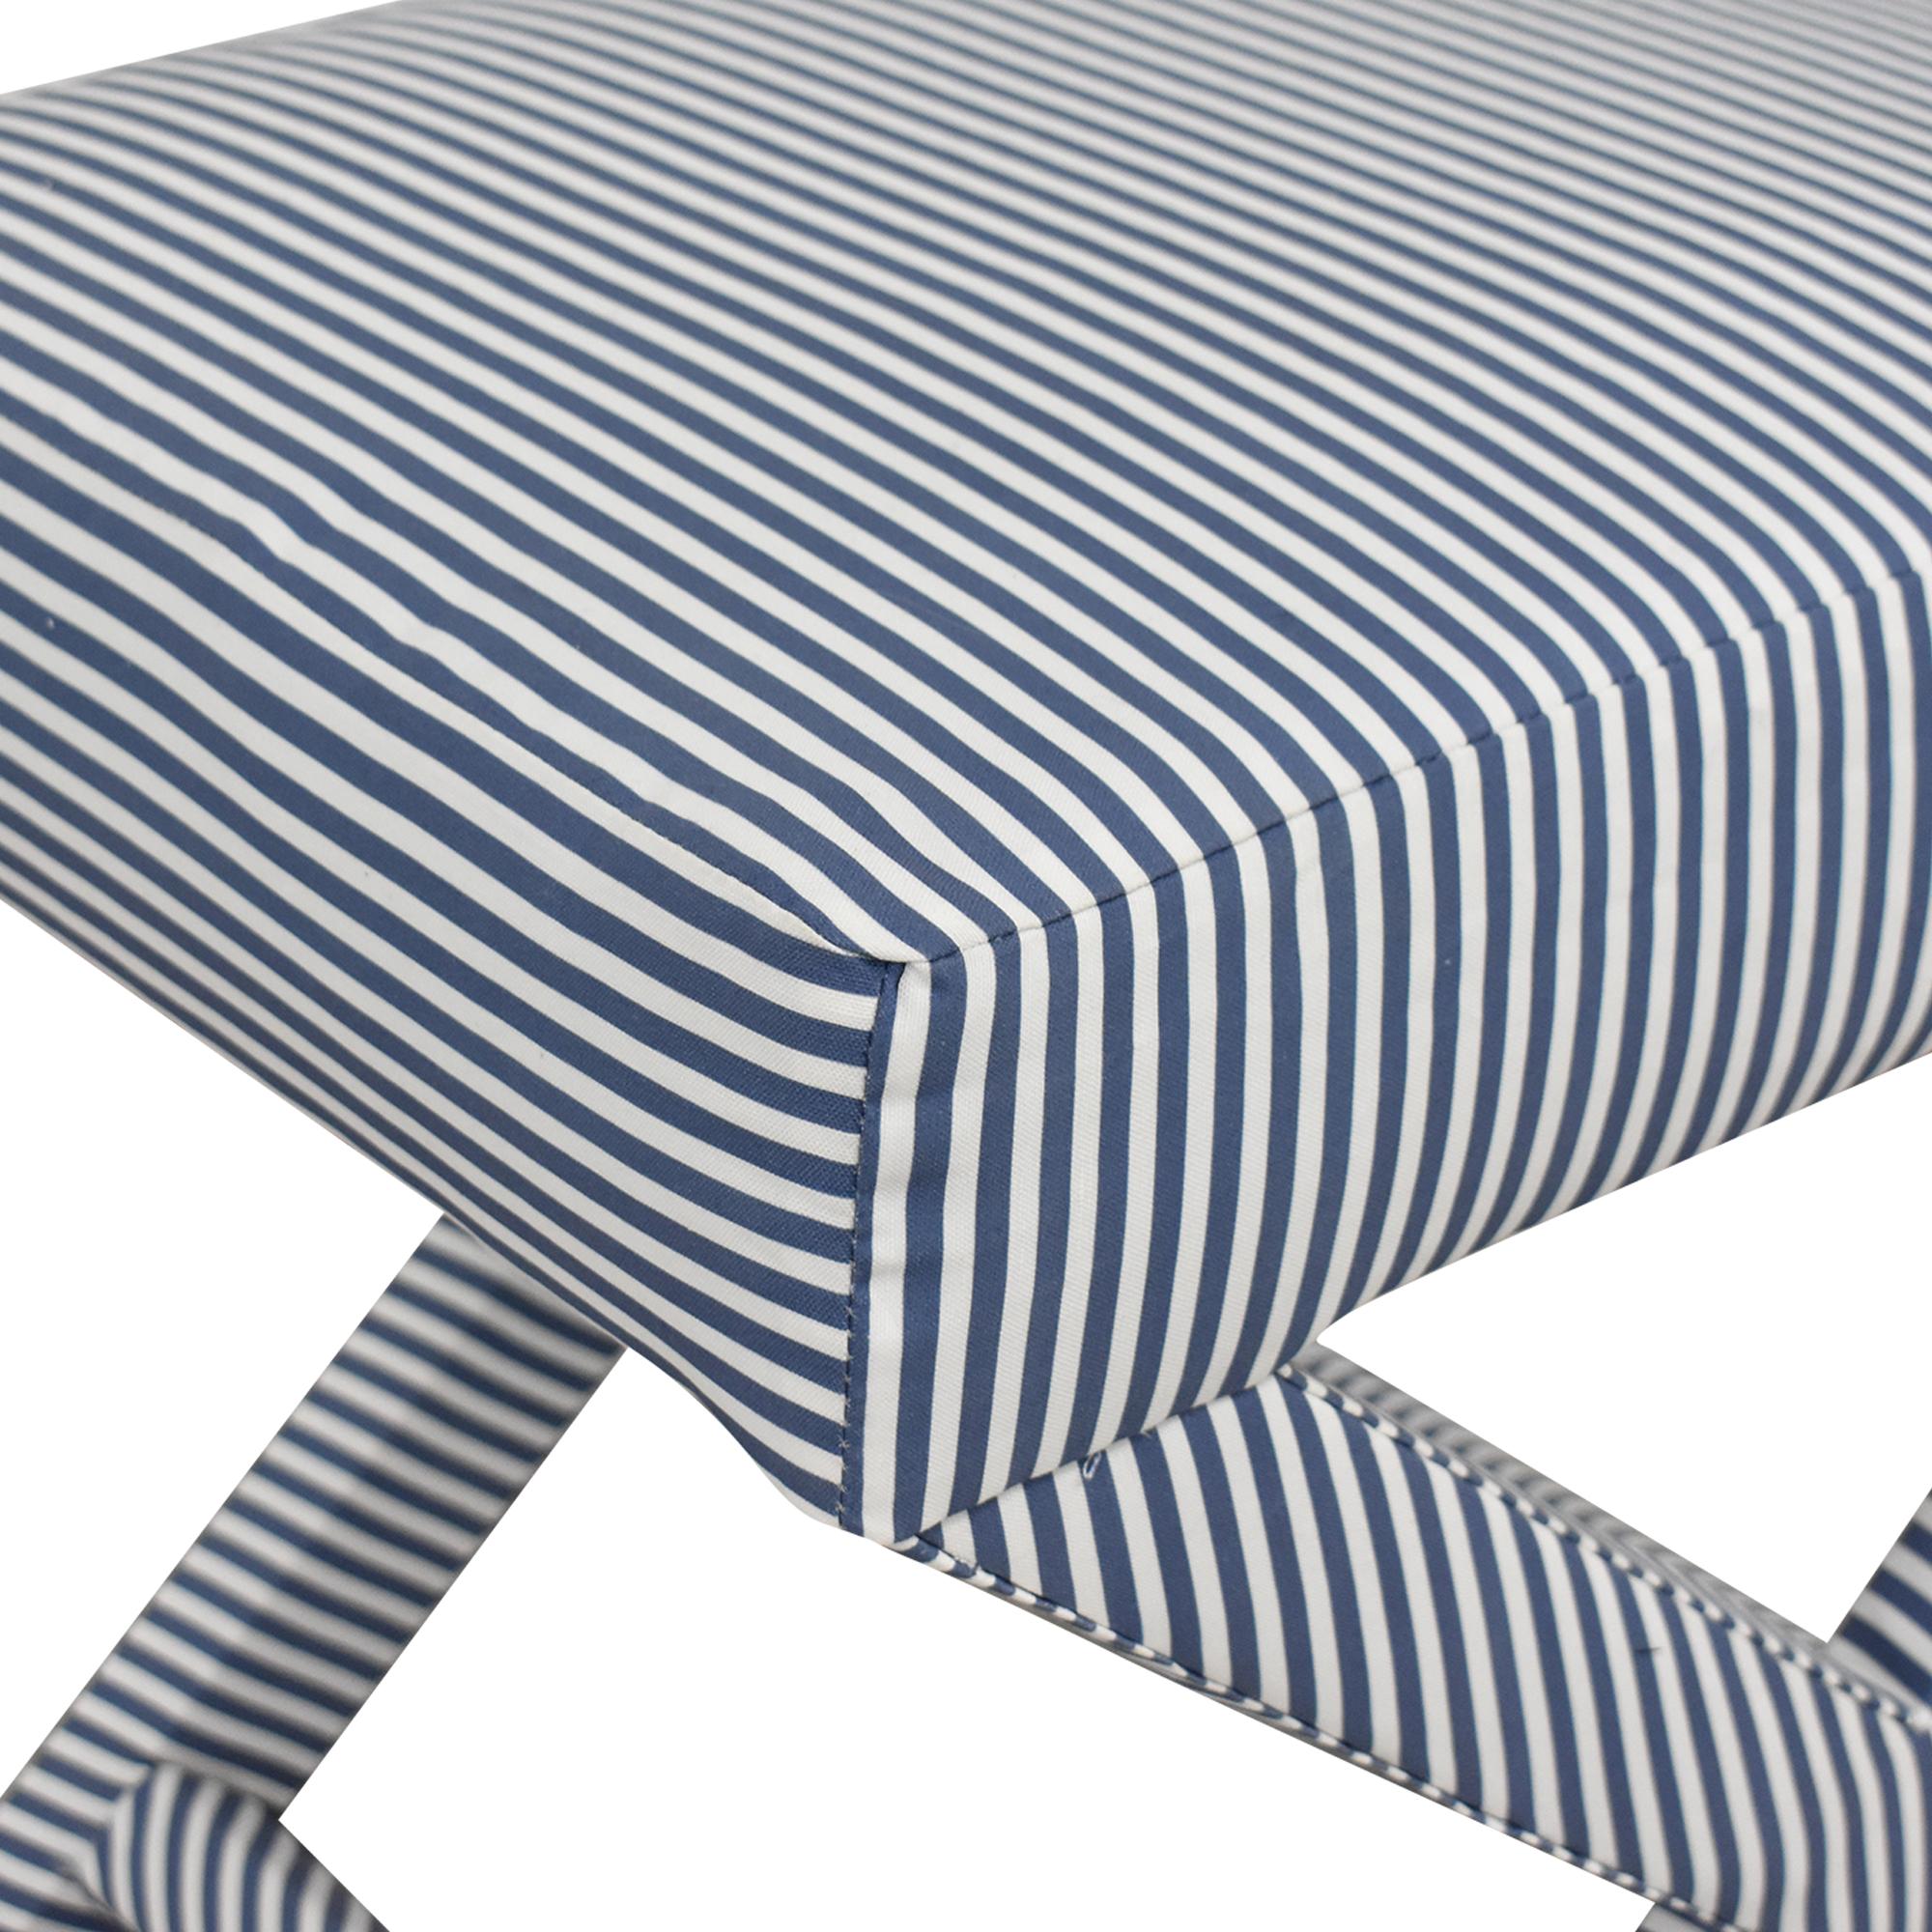 shop The Inside The inside Ticking Stripe X Bench online